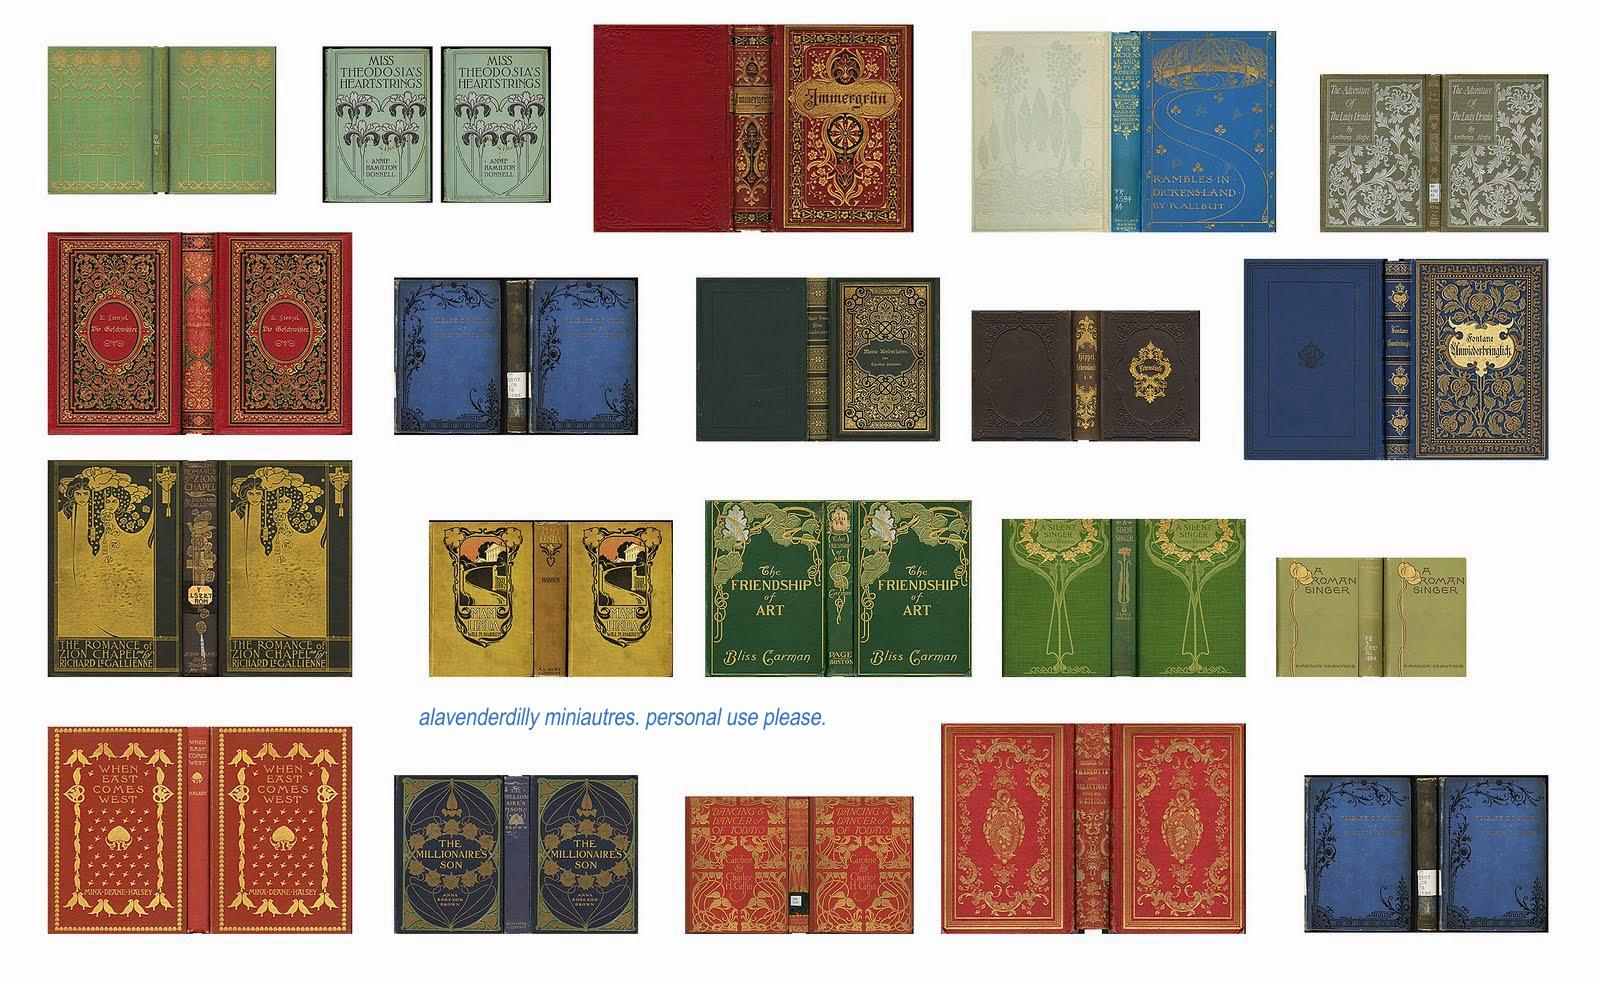 Book Cover Printable Upload : 画像 ミニチュアブックの本【豆本】が作れる!無料テンプレート素材【表紙型紙・作り方】 naver まとめ